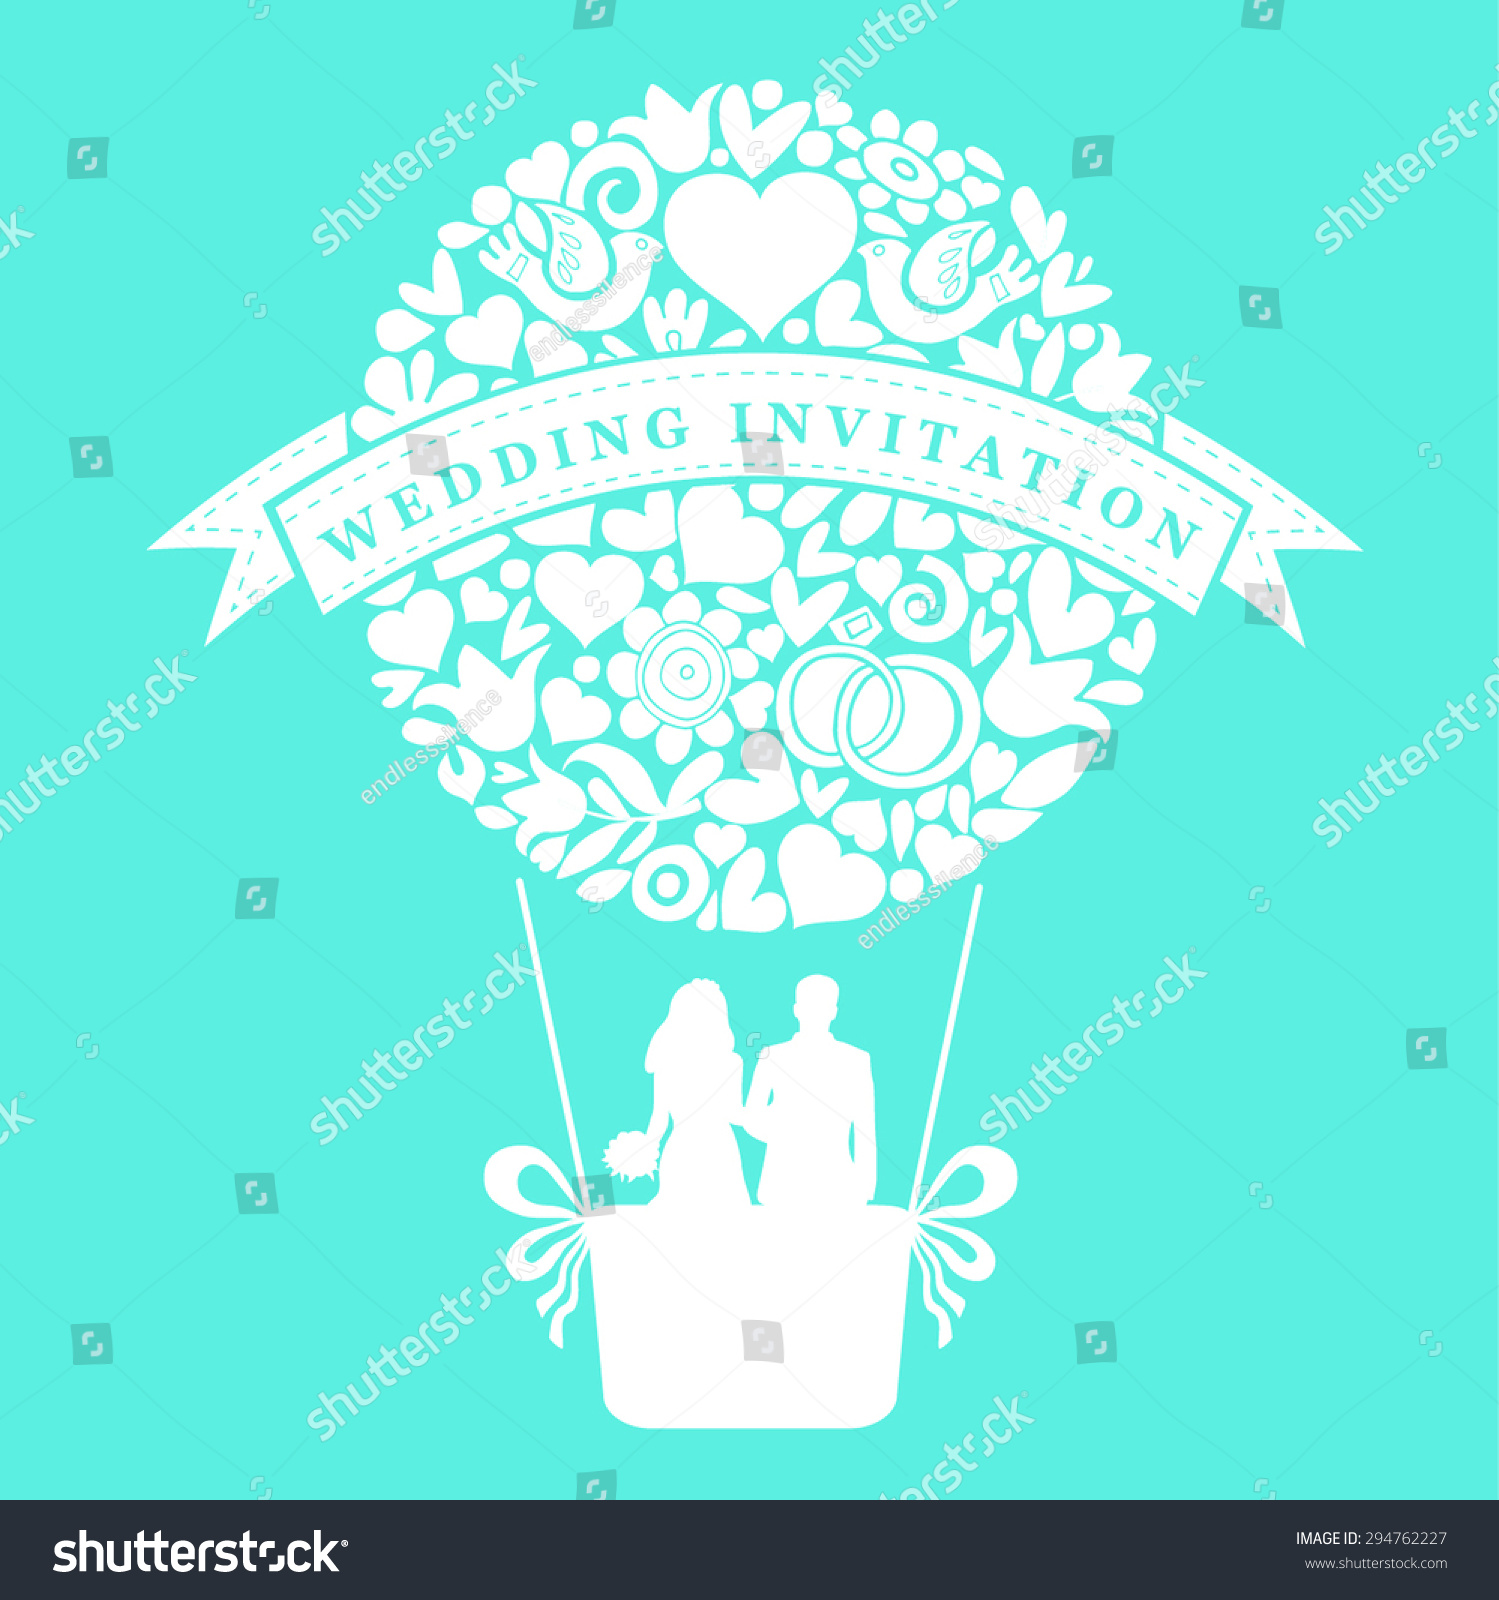 Vector Wedding Invitation Choice Image Party Invitations Ideas